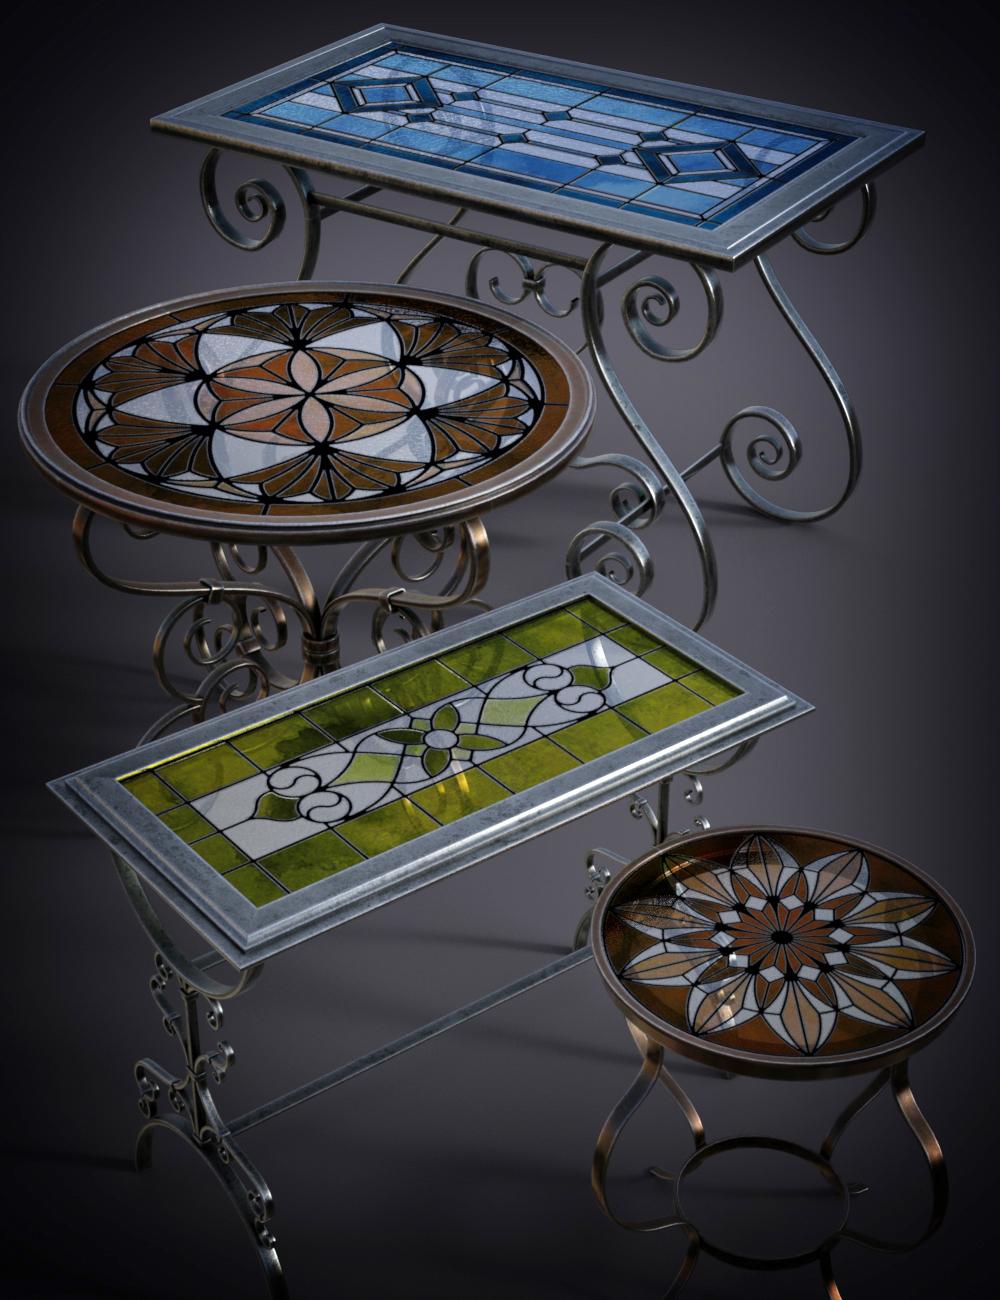 B.E.T.T.Y. Stained Glass Tables by: B.E.T.T.Y, 3D Models by Daz 3D